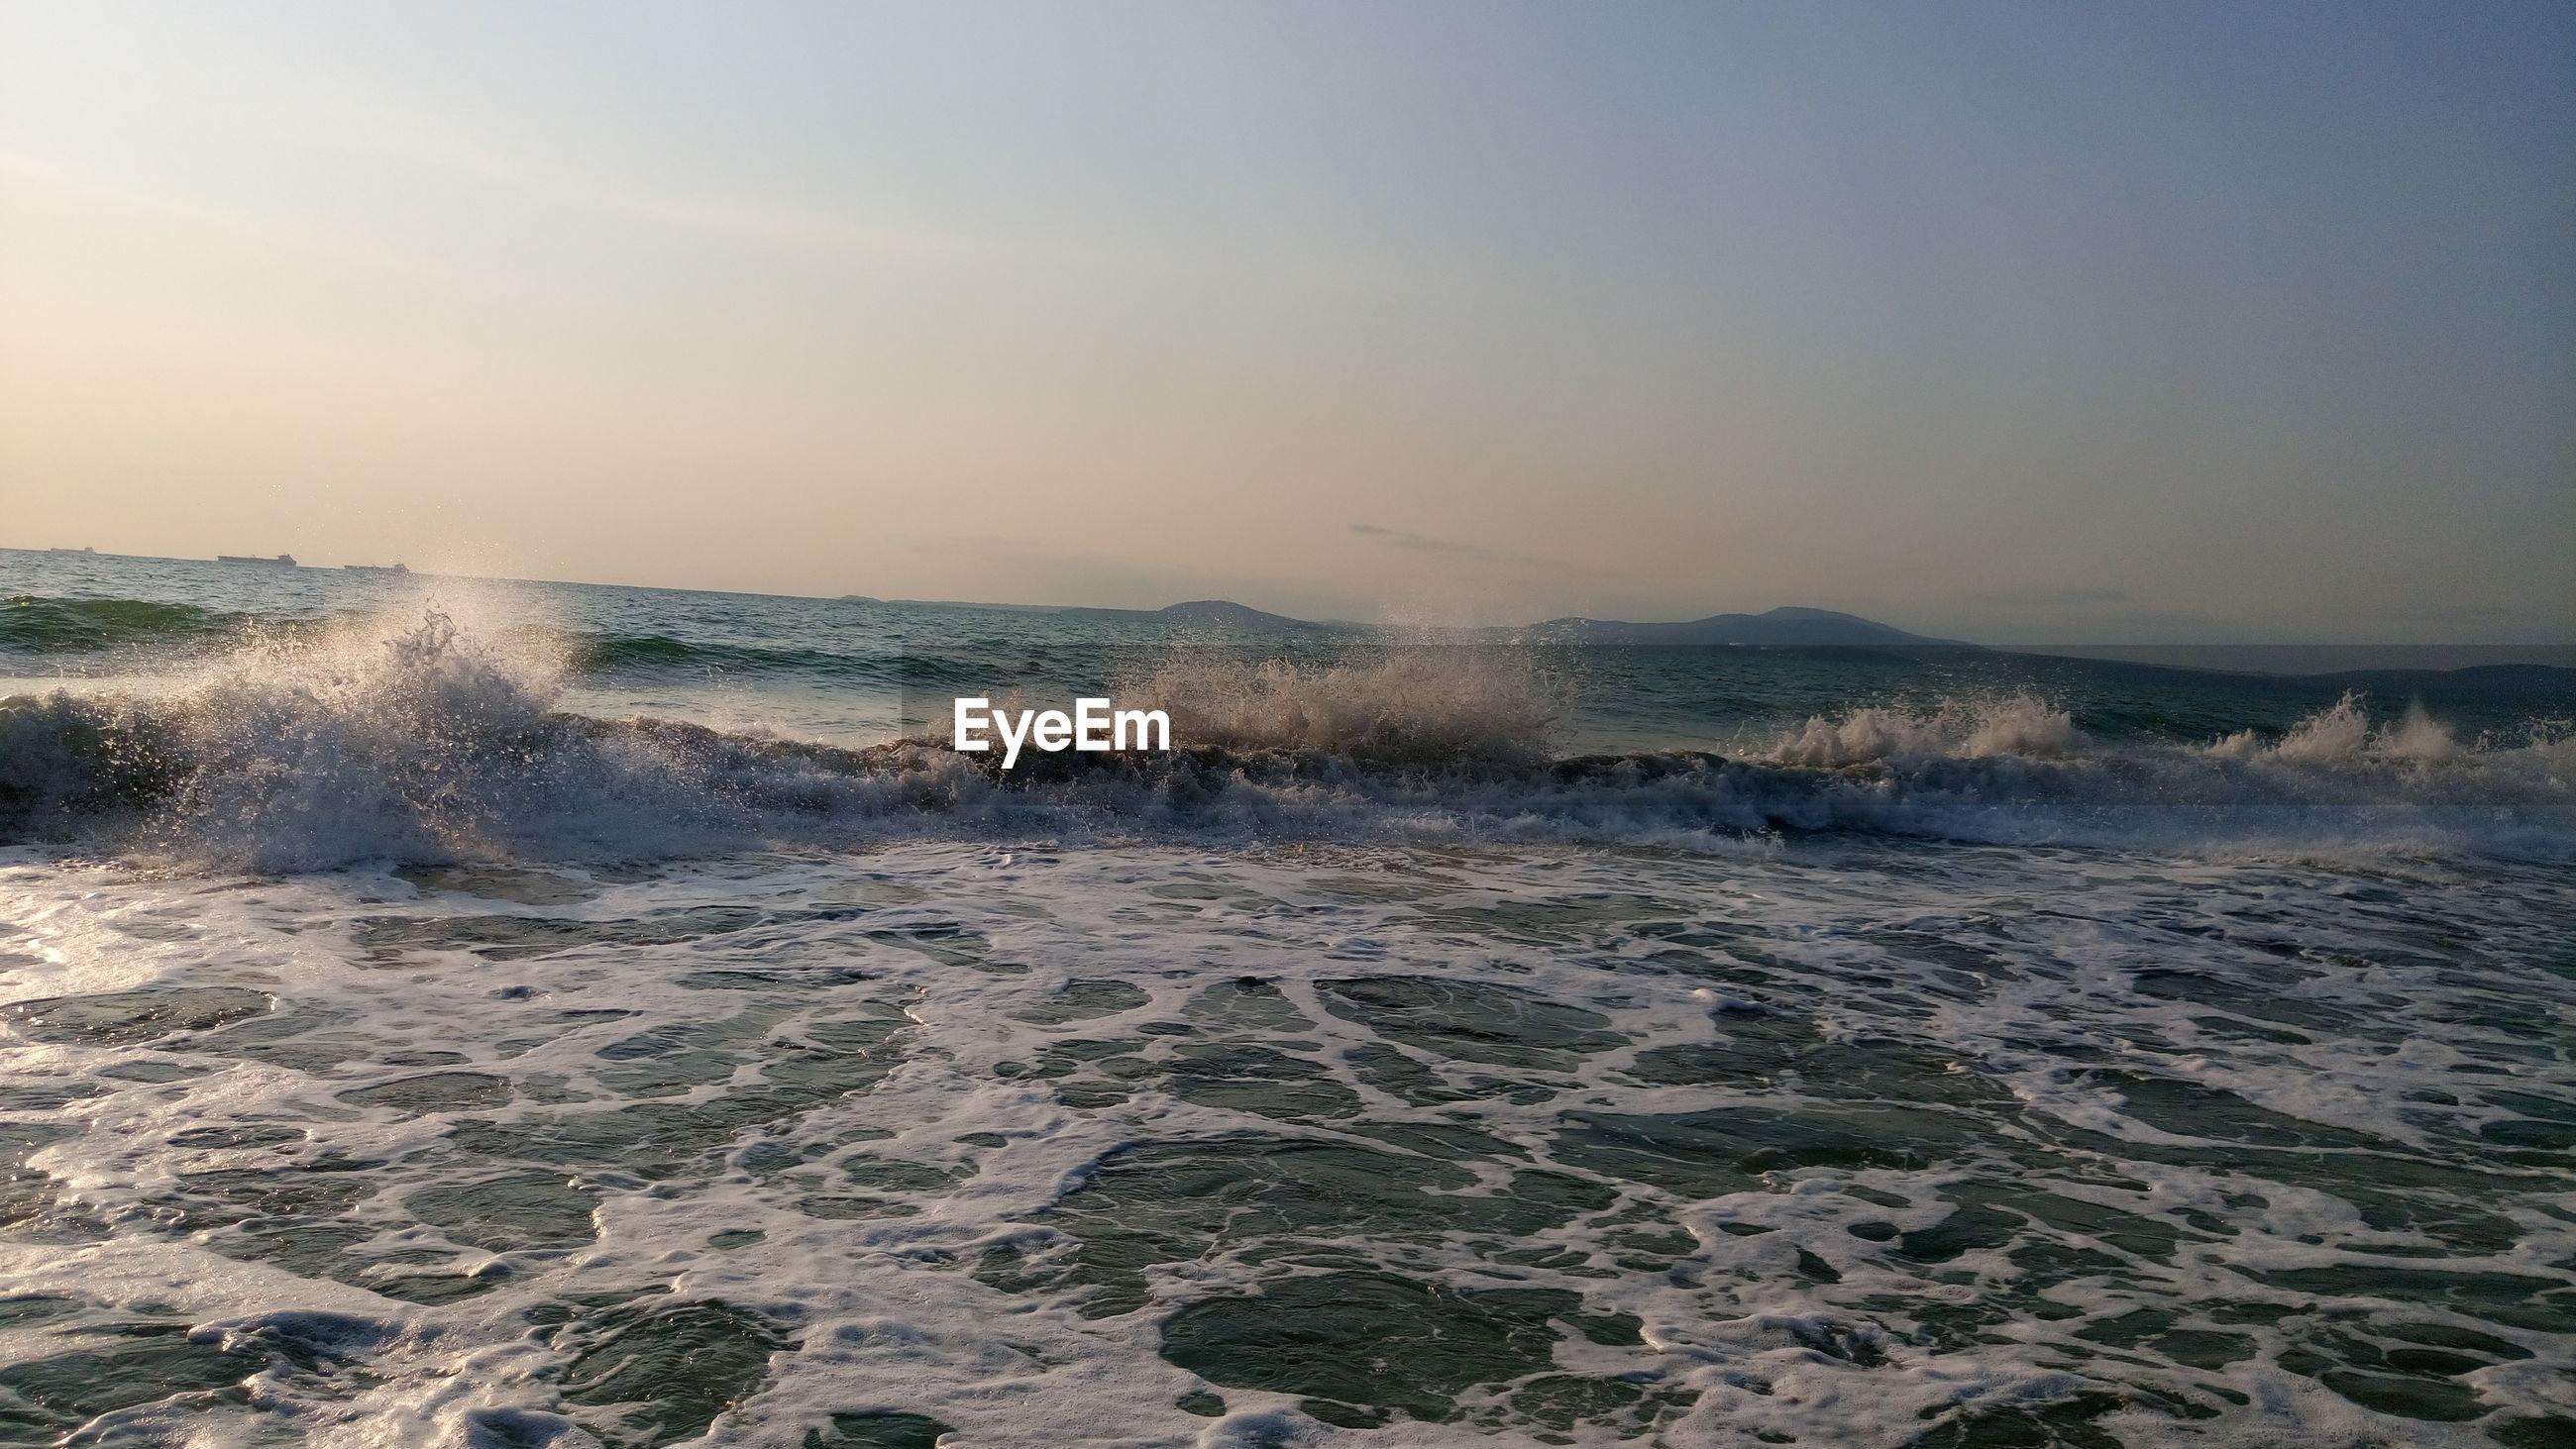 Waves splashing in sea against sky during sunset